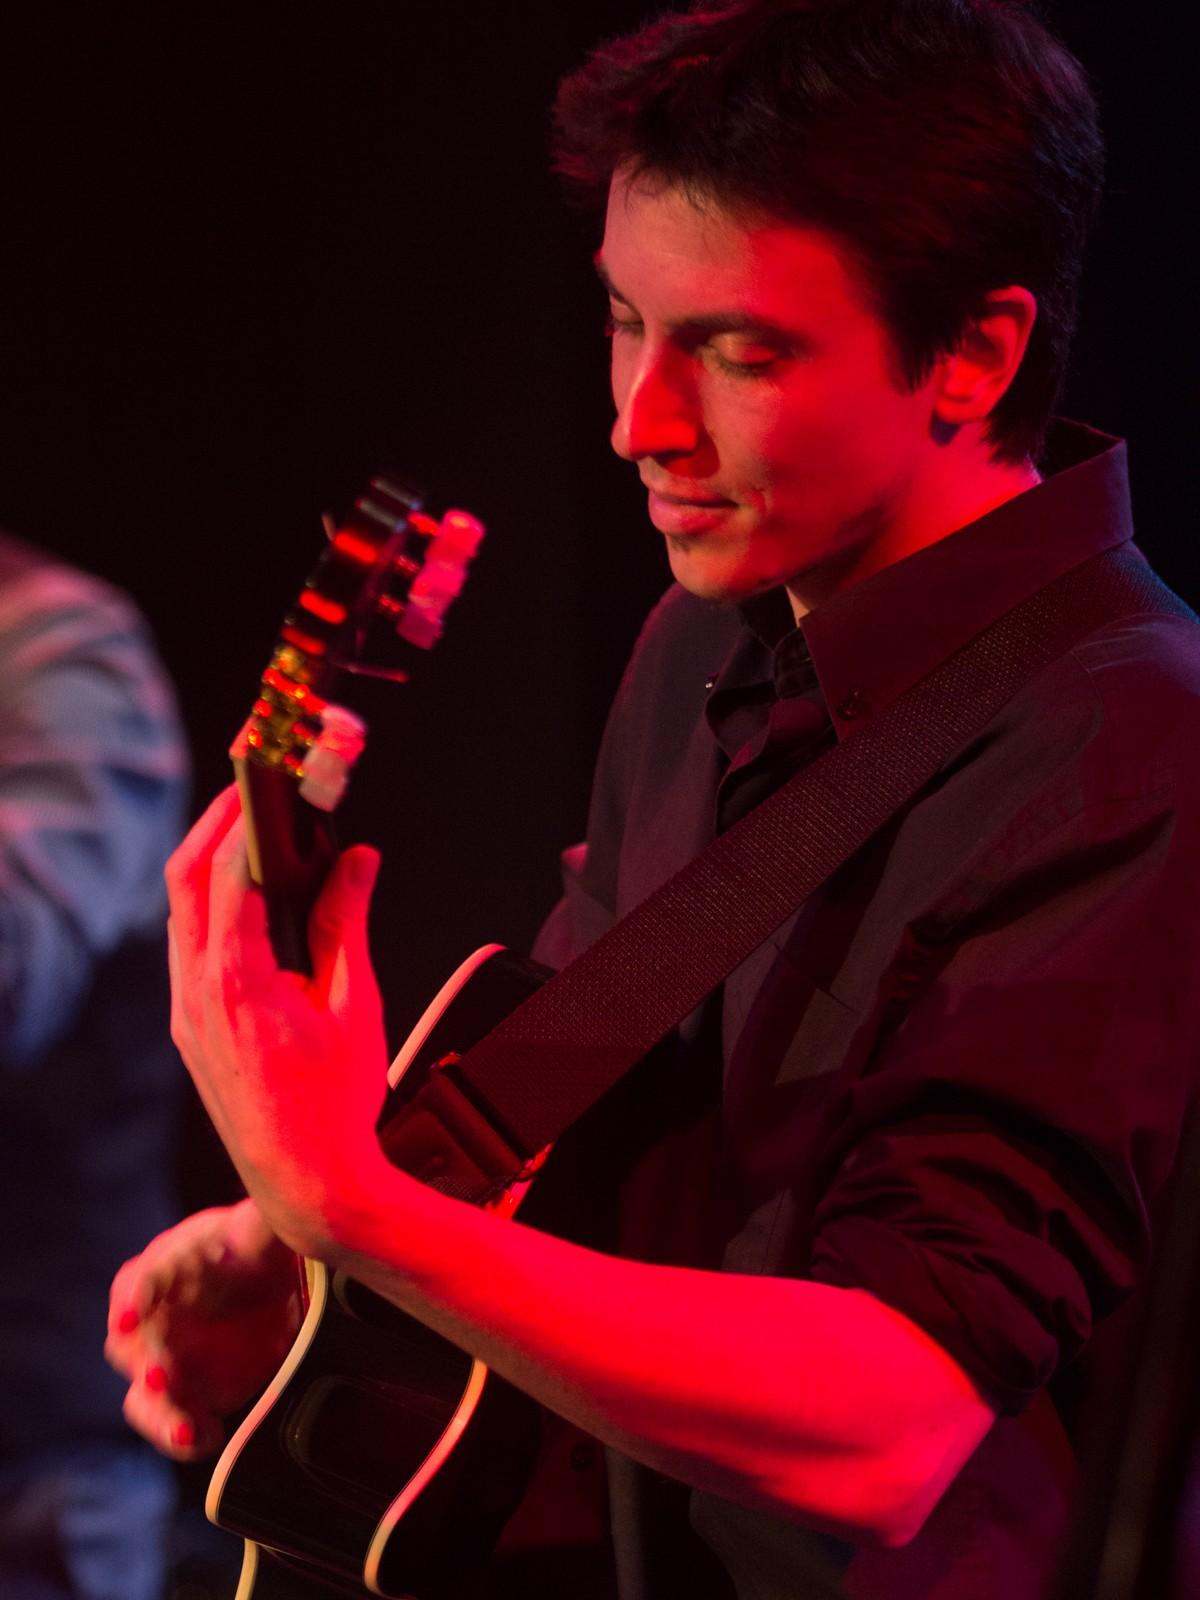 jamlik-tom-guitare-mjc-crepy-picardie-mouv-byCCPV